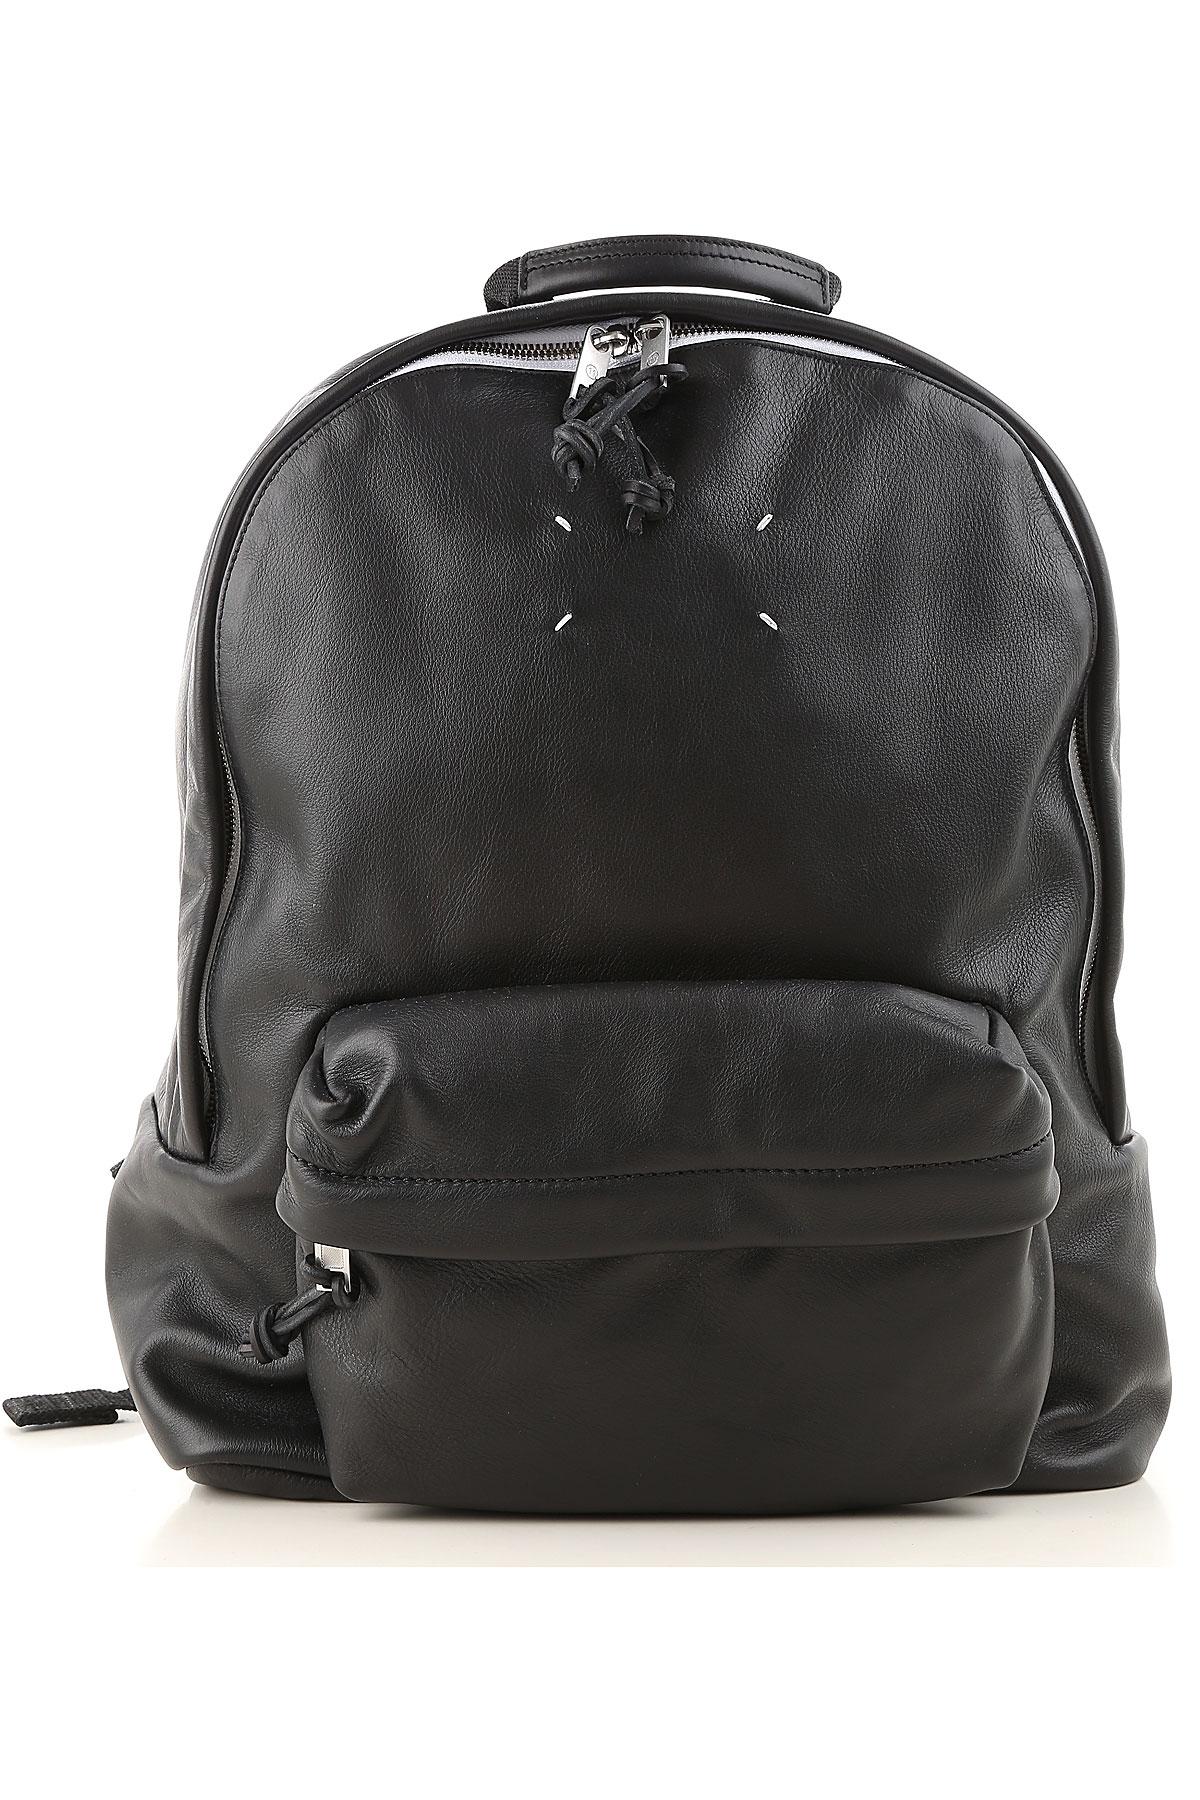 Image of Maison Martin Margiela Backpack for Women, Black, Leather, 2017